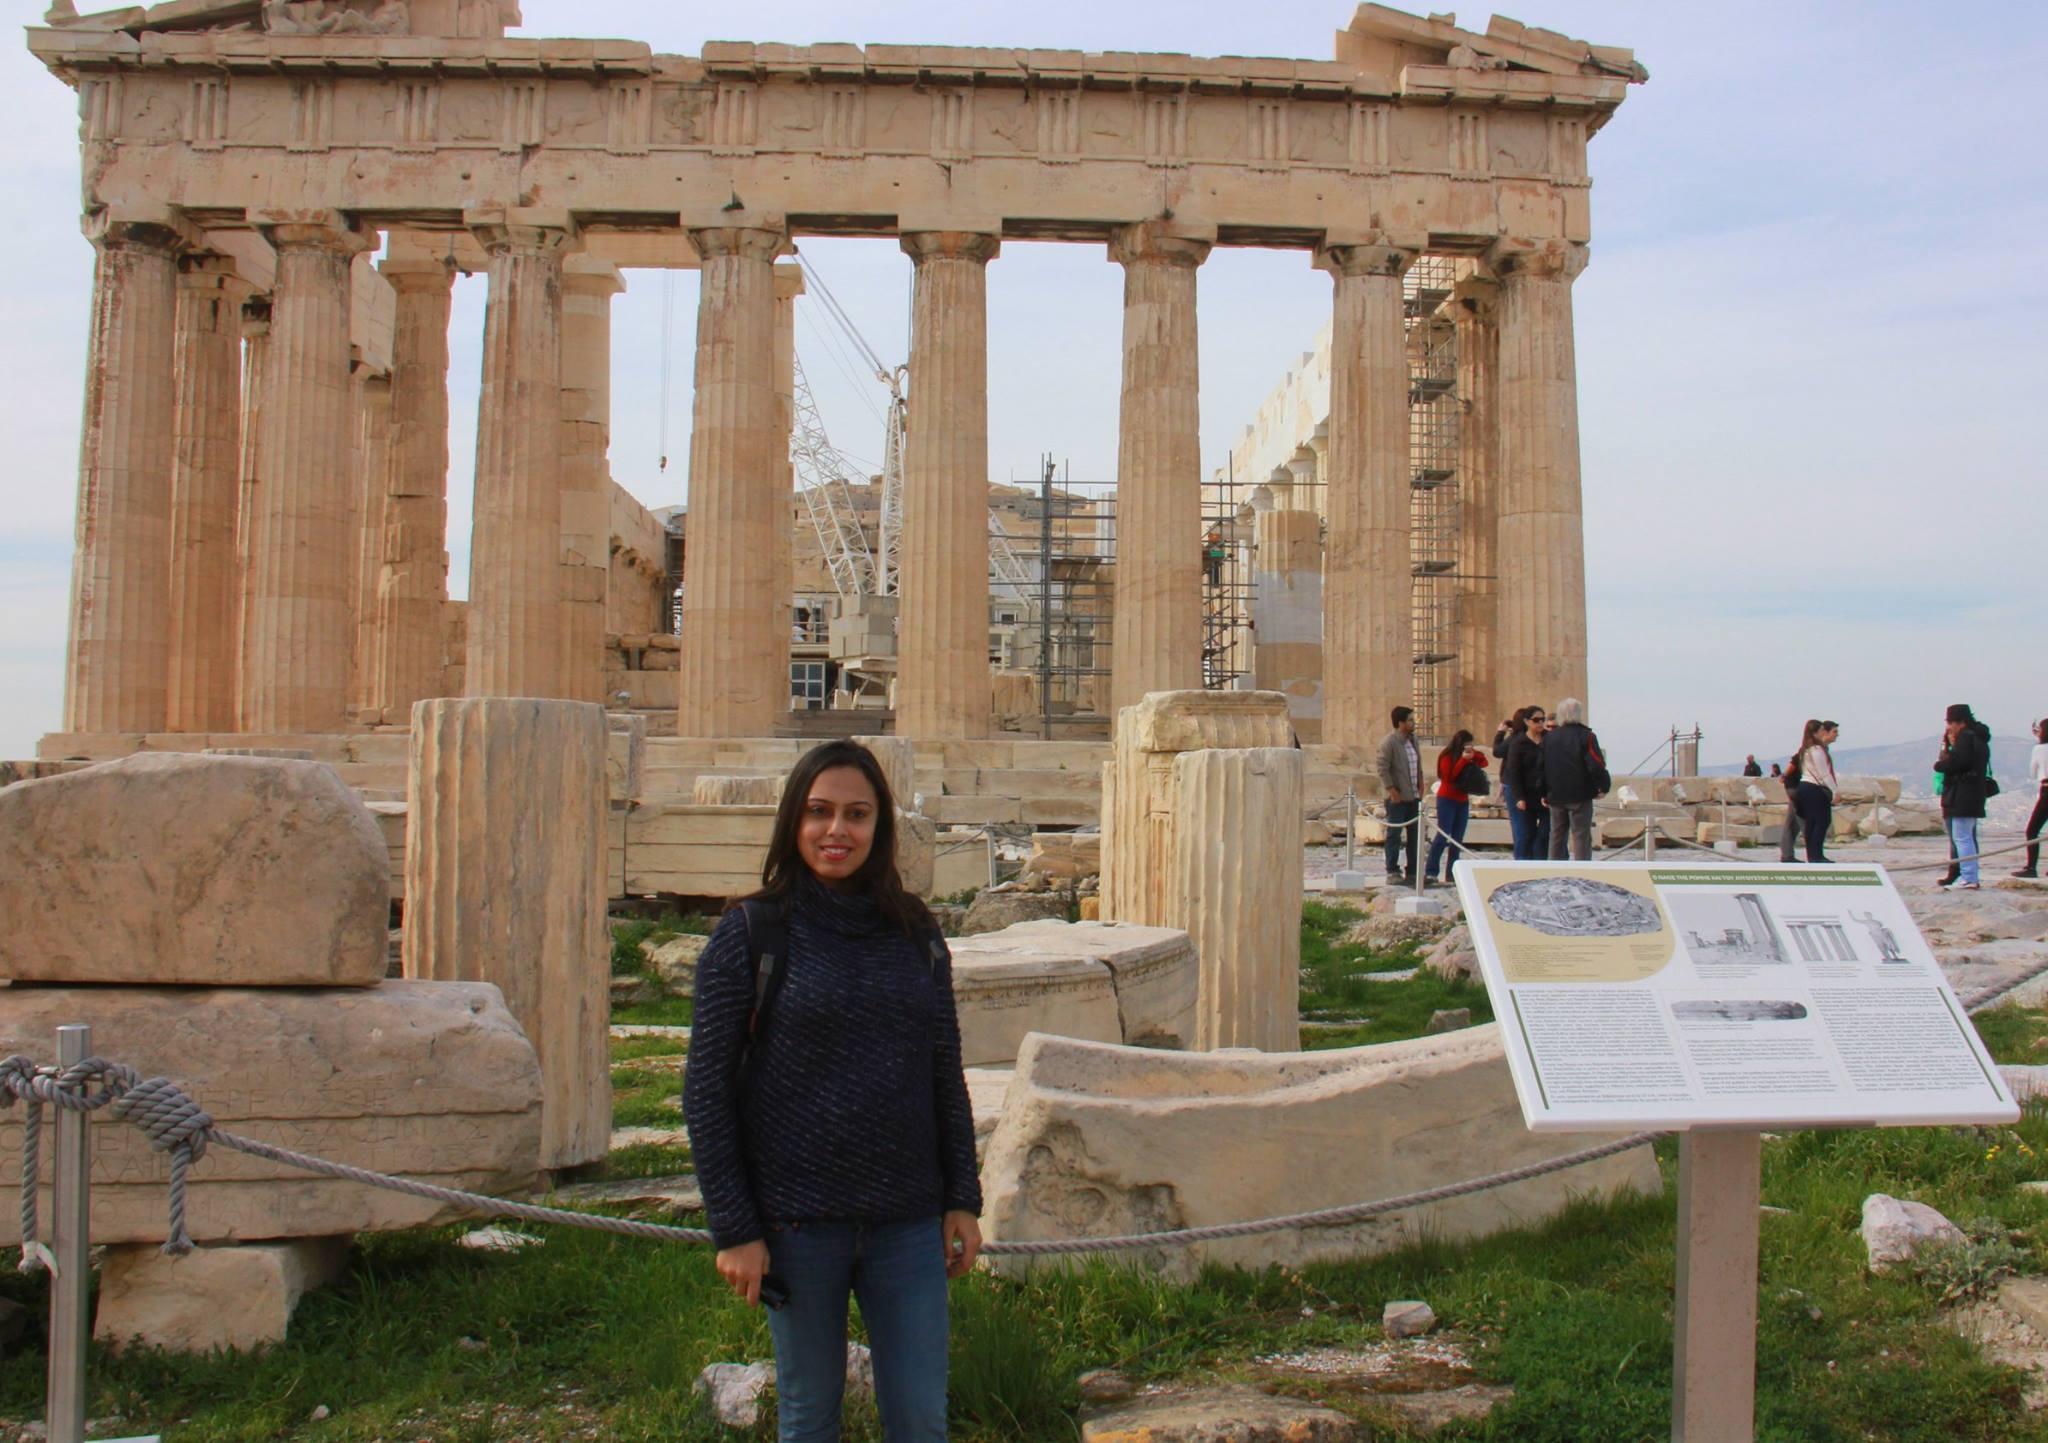 #travelbloggerindia #travelblogindia #travelingwhenpregnant